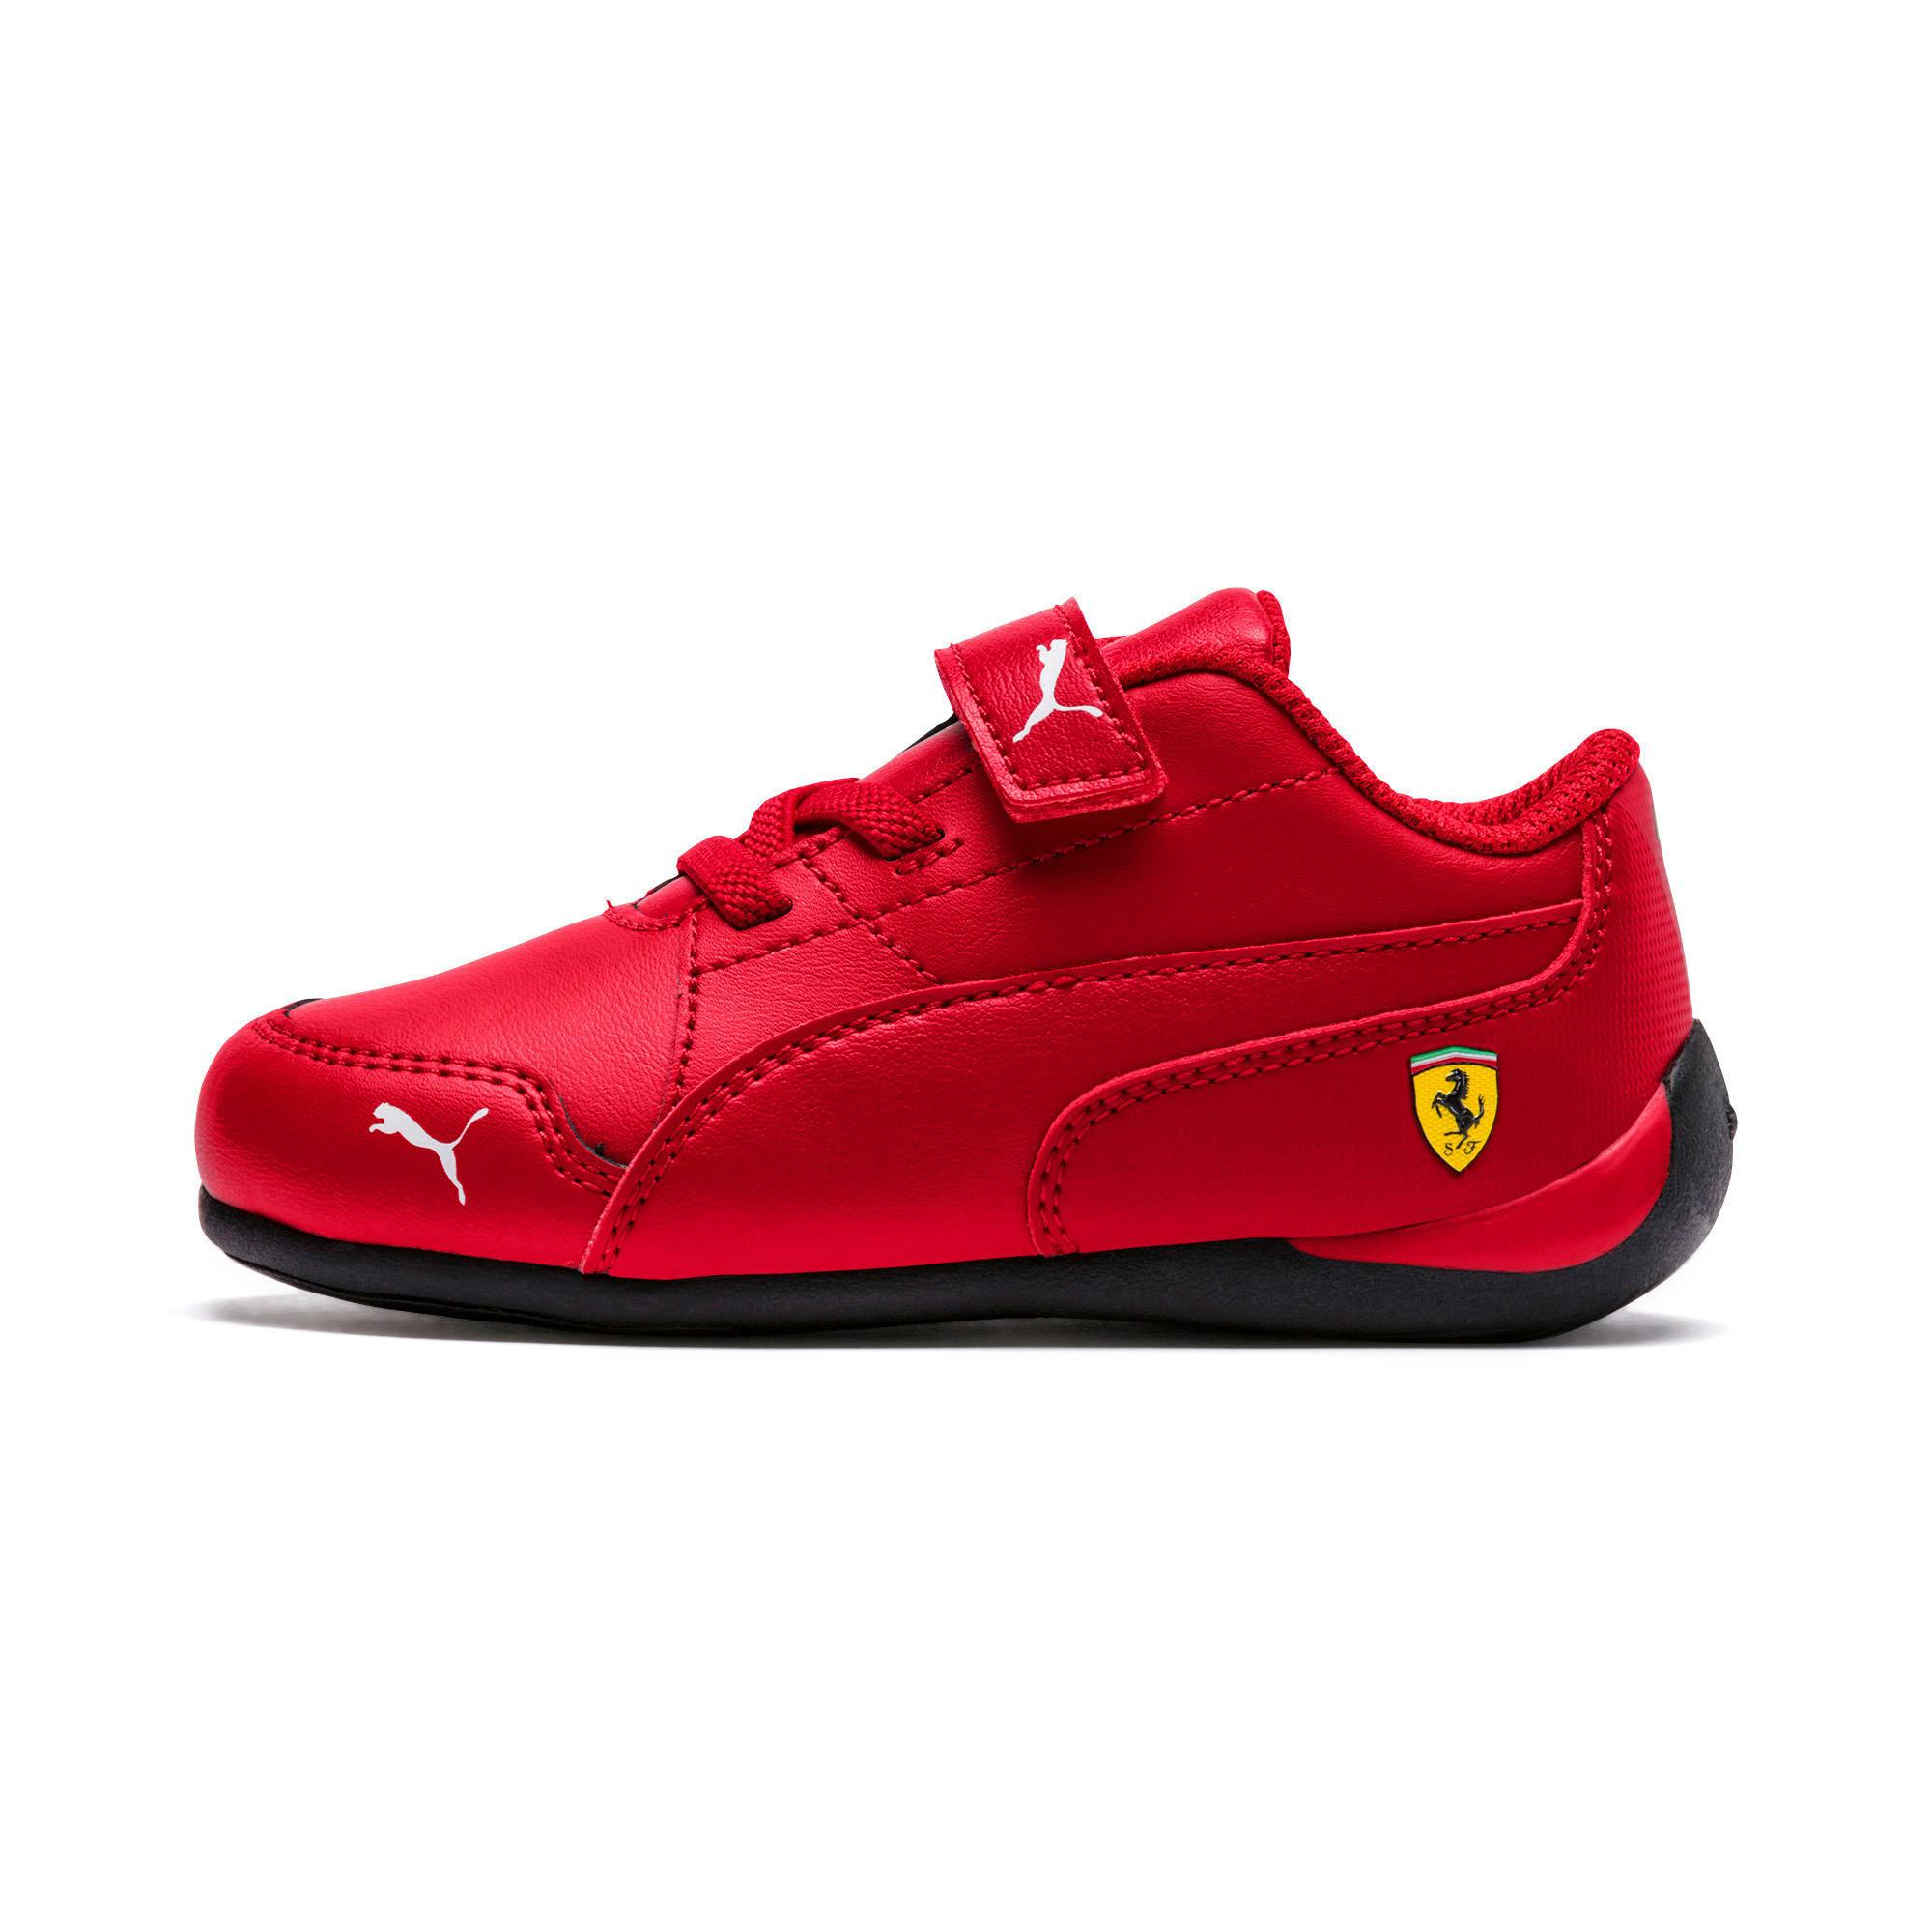 Thumbnail 1 of Ferrari Drift Cat 7 V Kinder Sneaker, Rosso Corsa-Rosso Corsa, medium